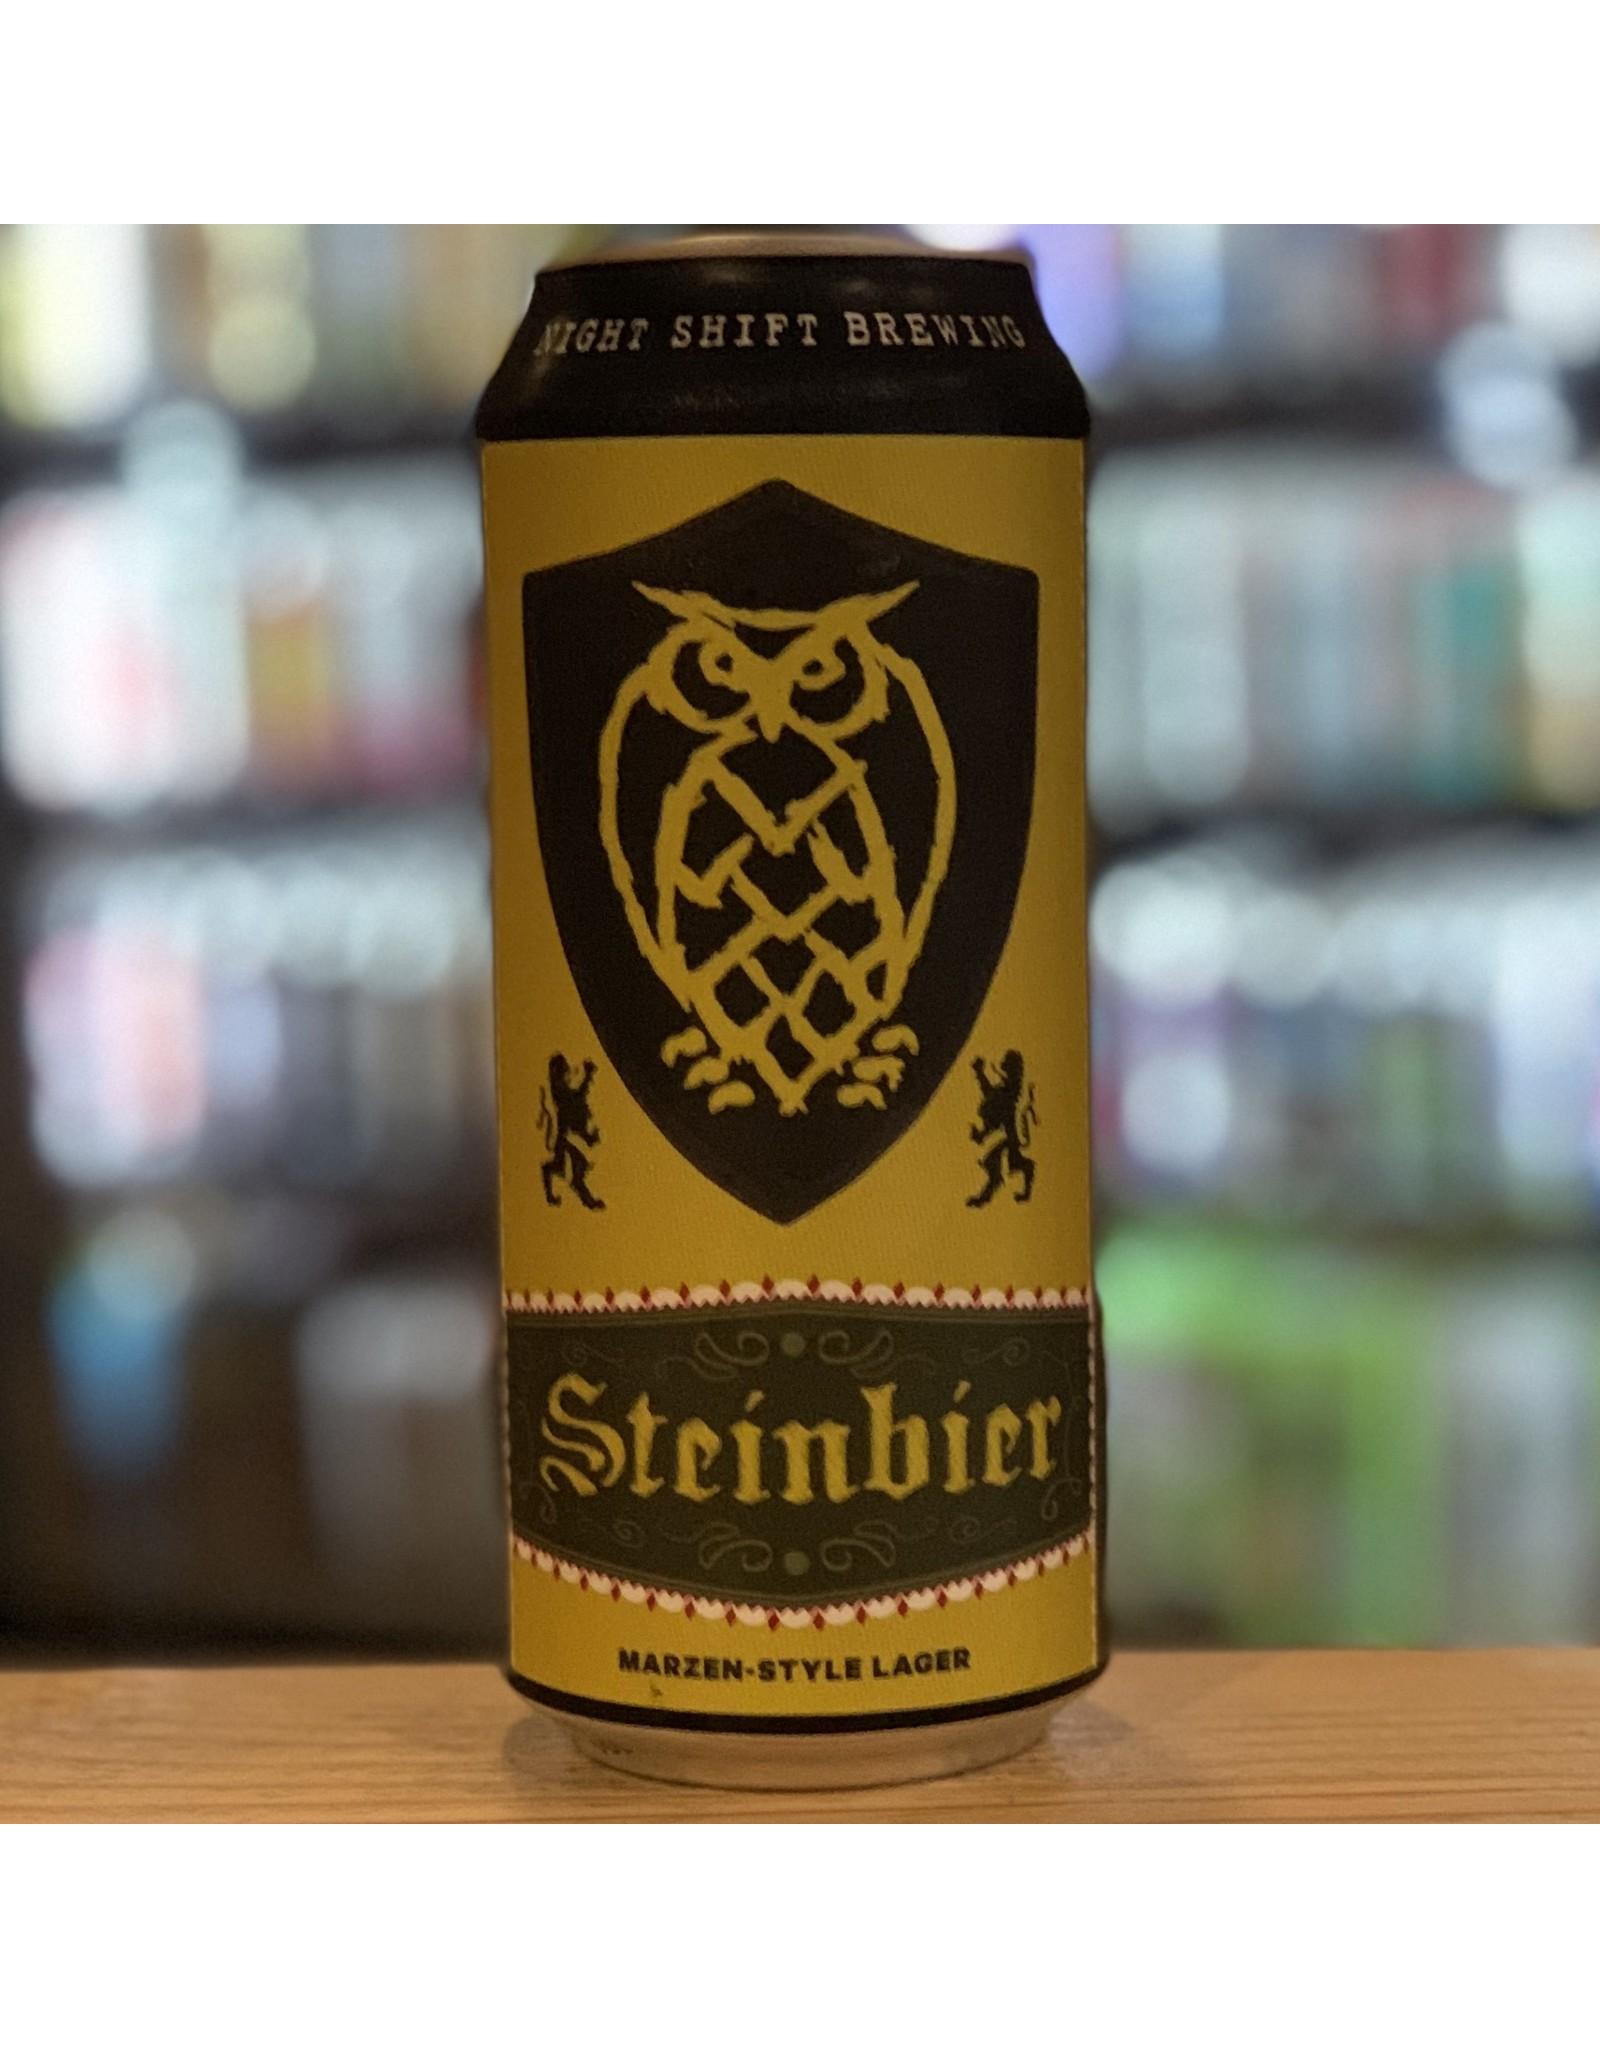 "Lager Night Shift Brewing ""Steinbier"" Marzen Lager - Everett, MA"